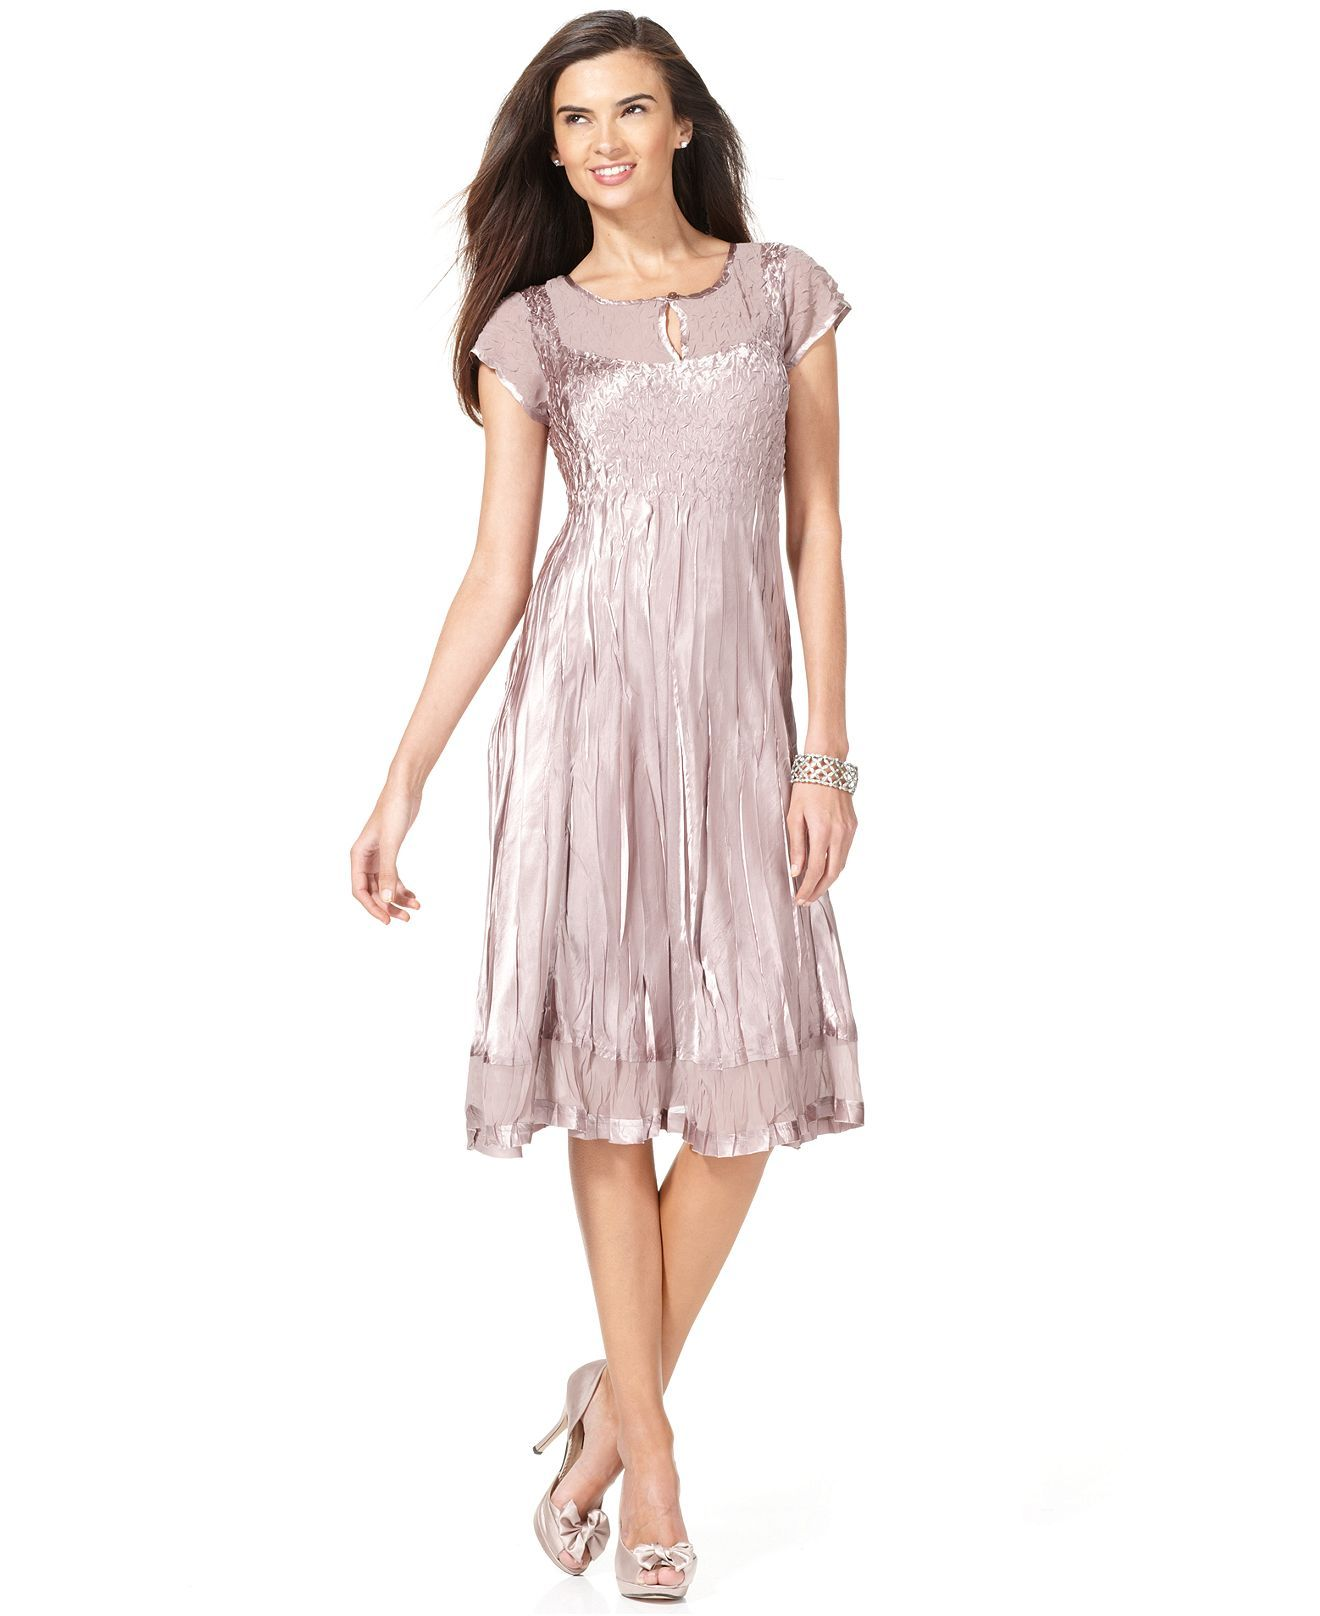 Sl sl fashion dresses - Sl Fashions Dress Short Sleeve Crinkled Satin Dresses Women Macy S